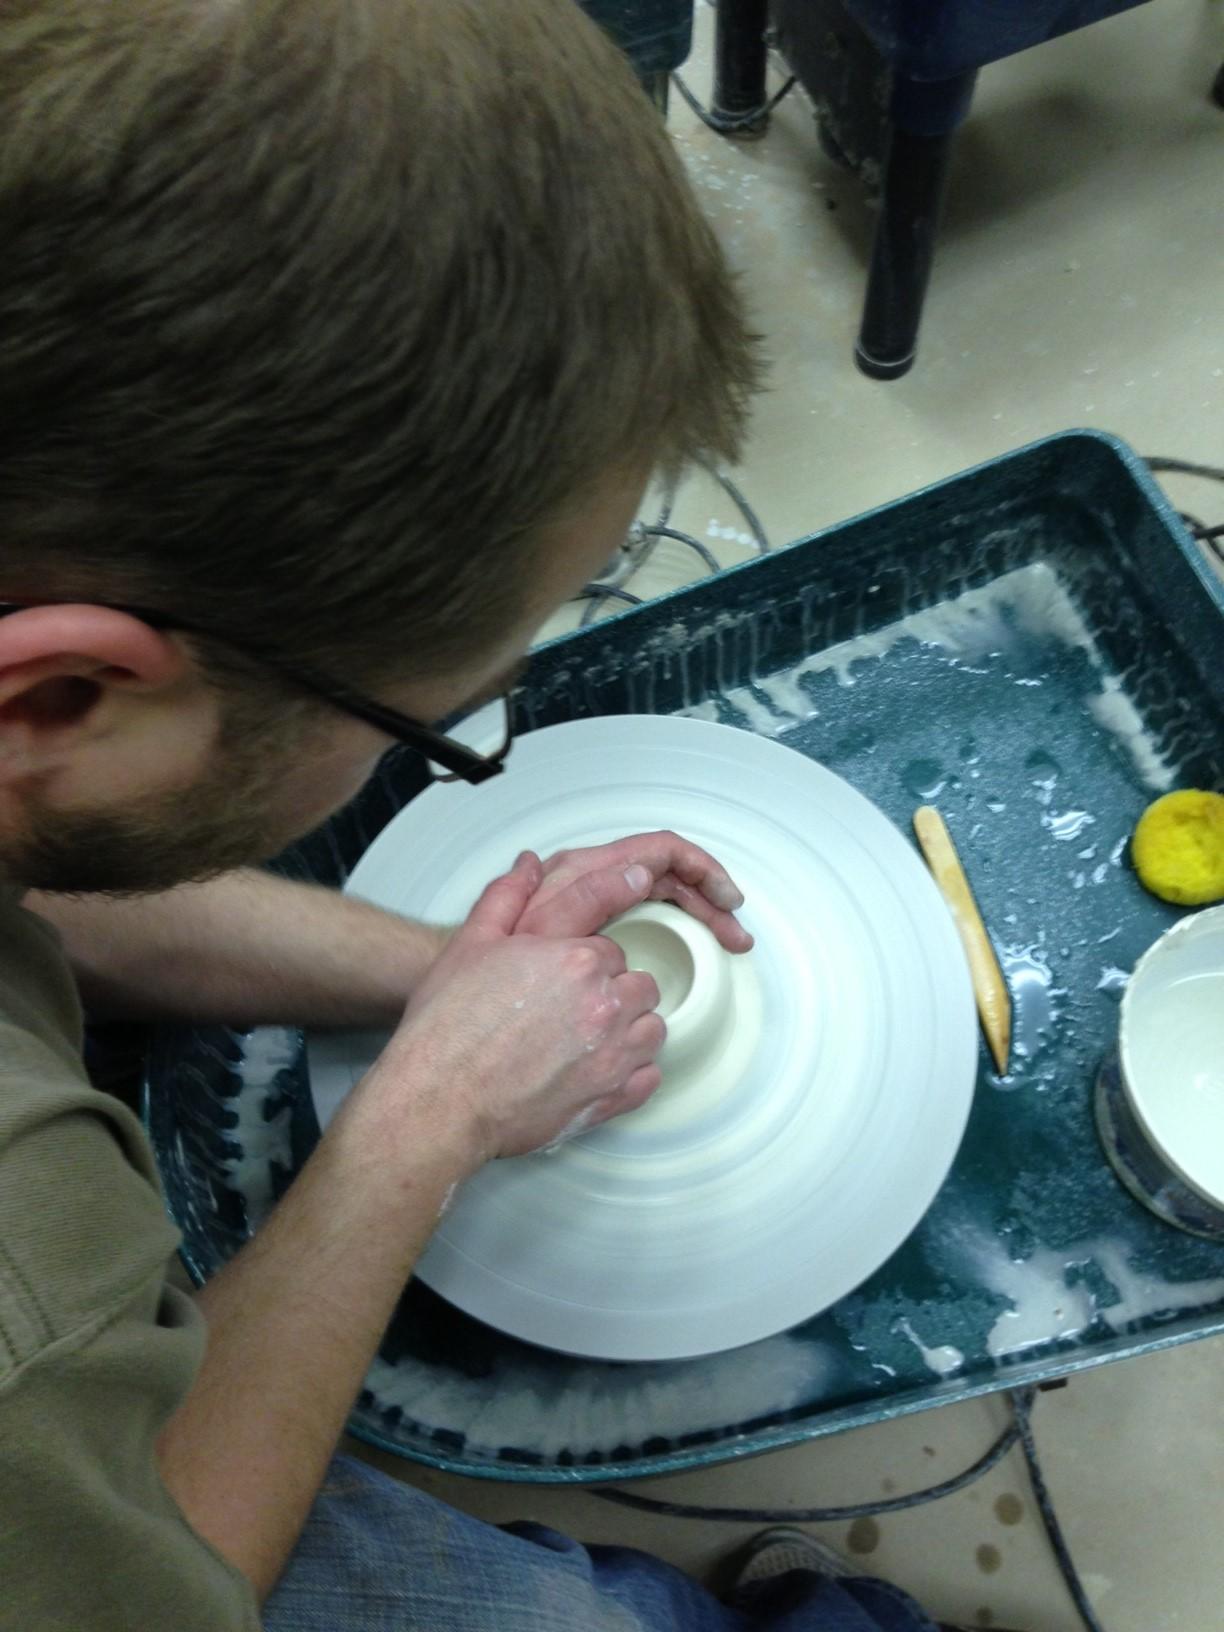 Drilling the pot - Joshua David Bennett